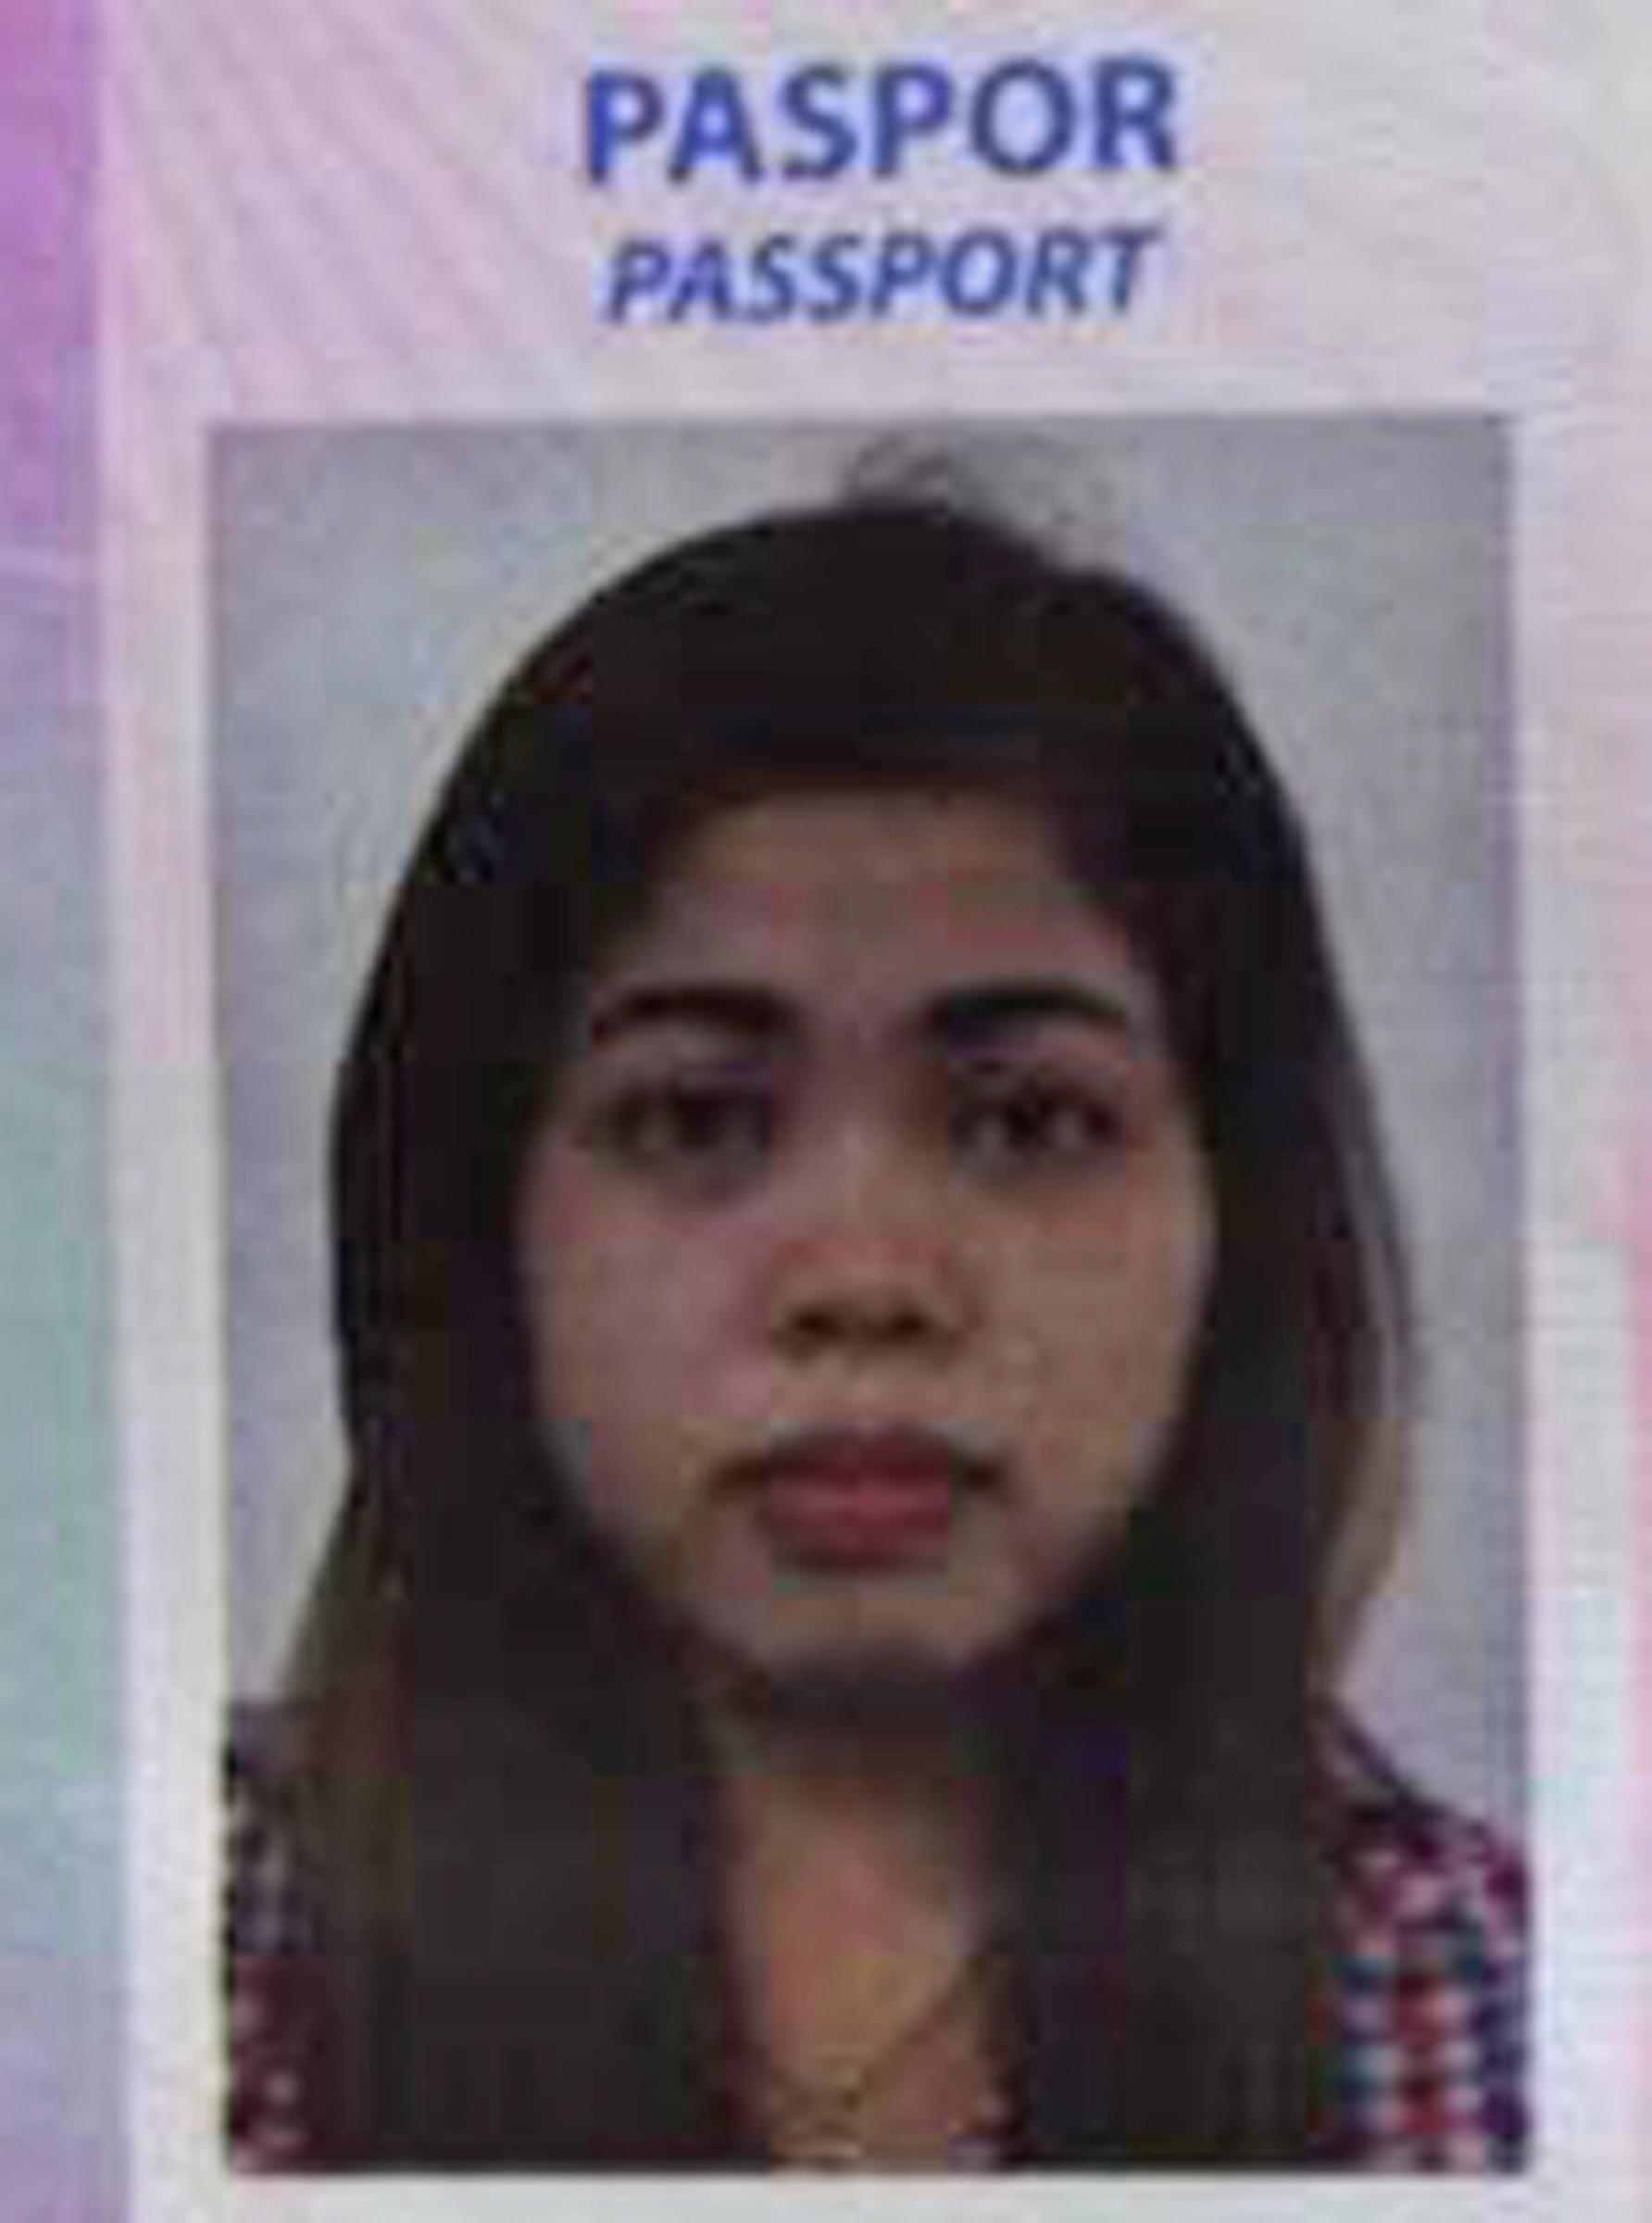 Portrait on the passport of Siti Aisyah. (Kumparan via AP)